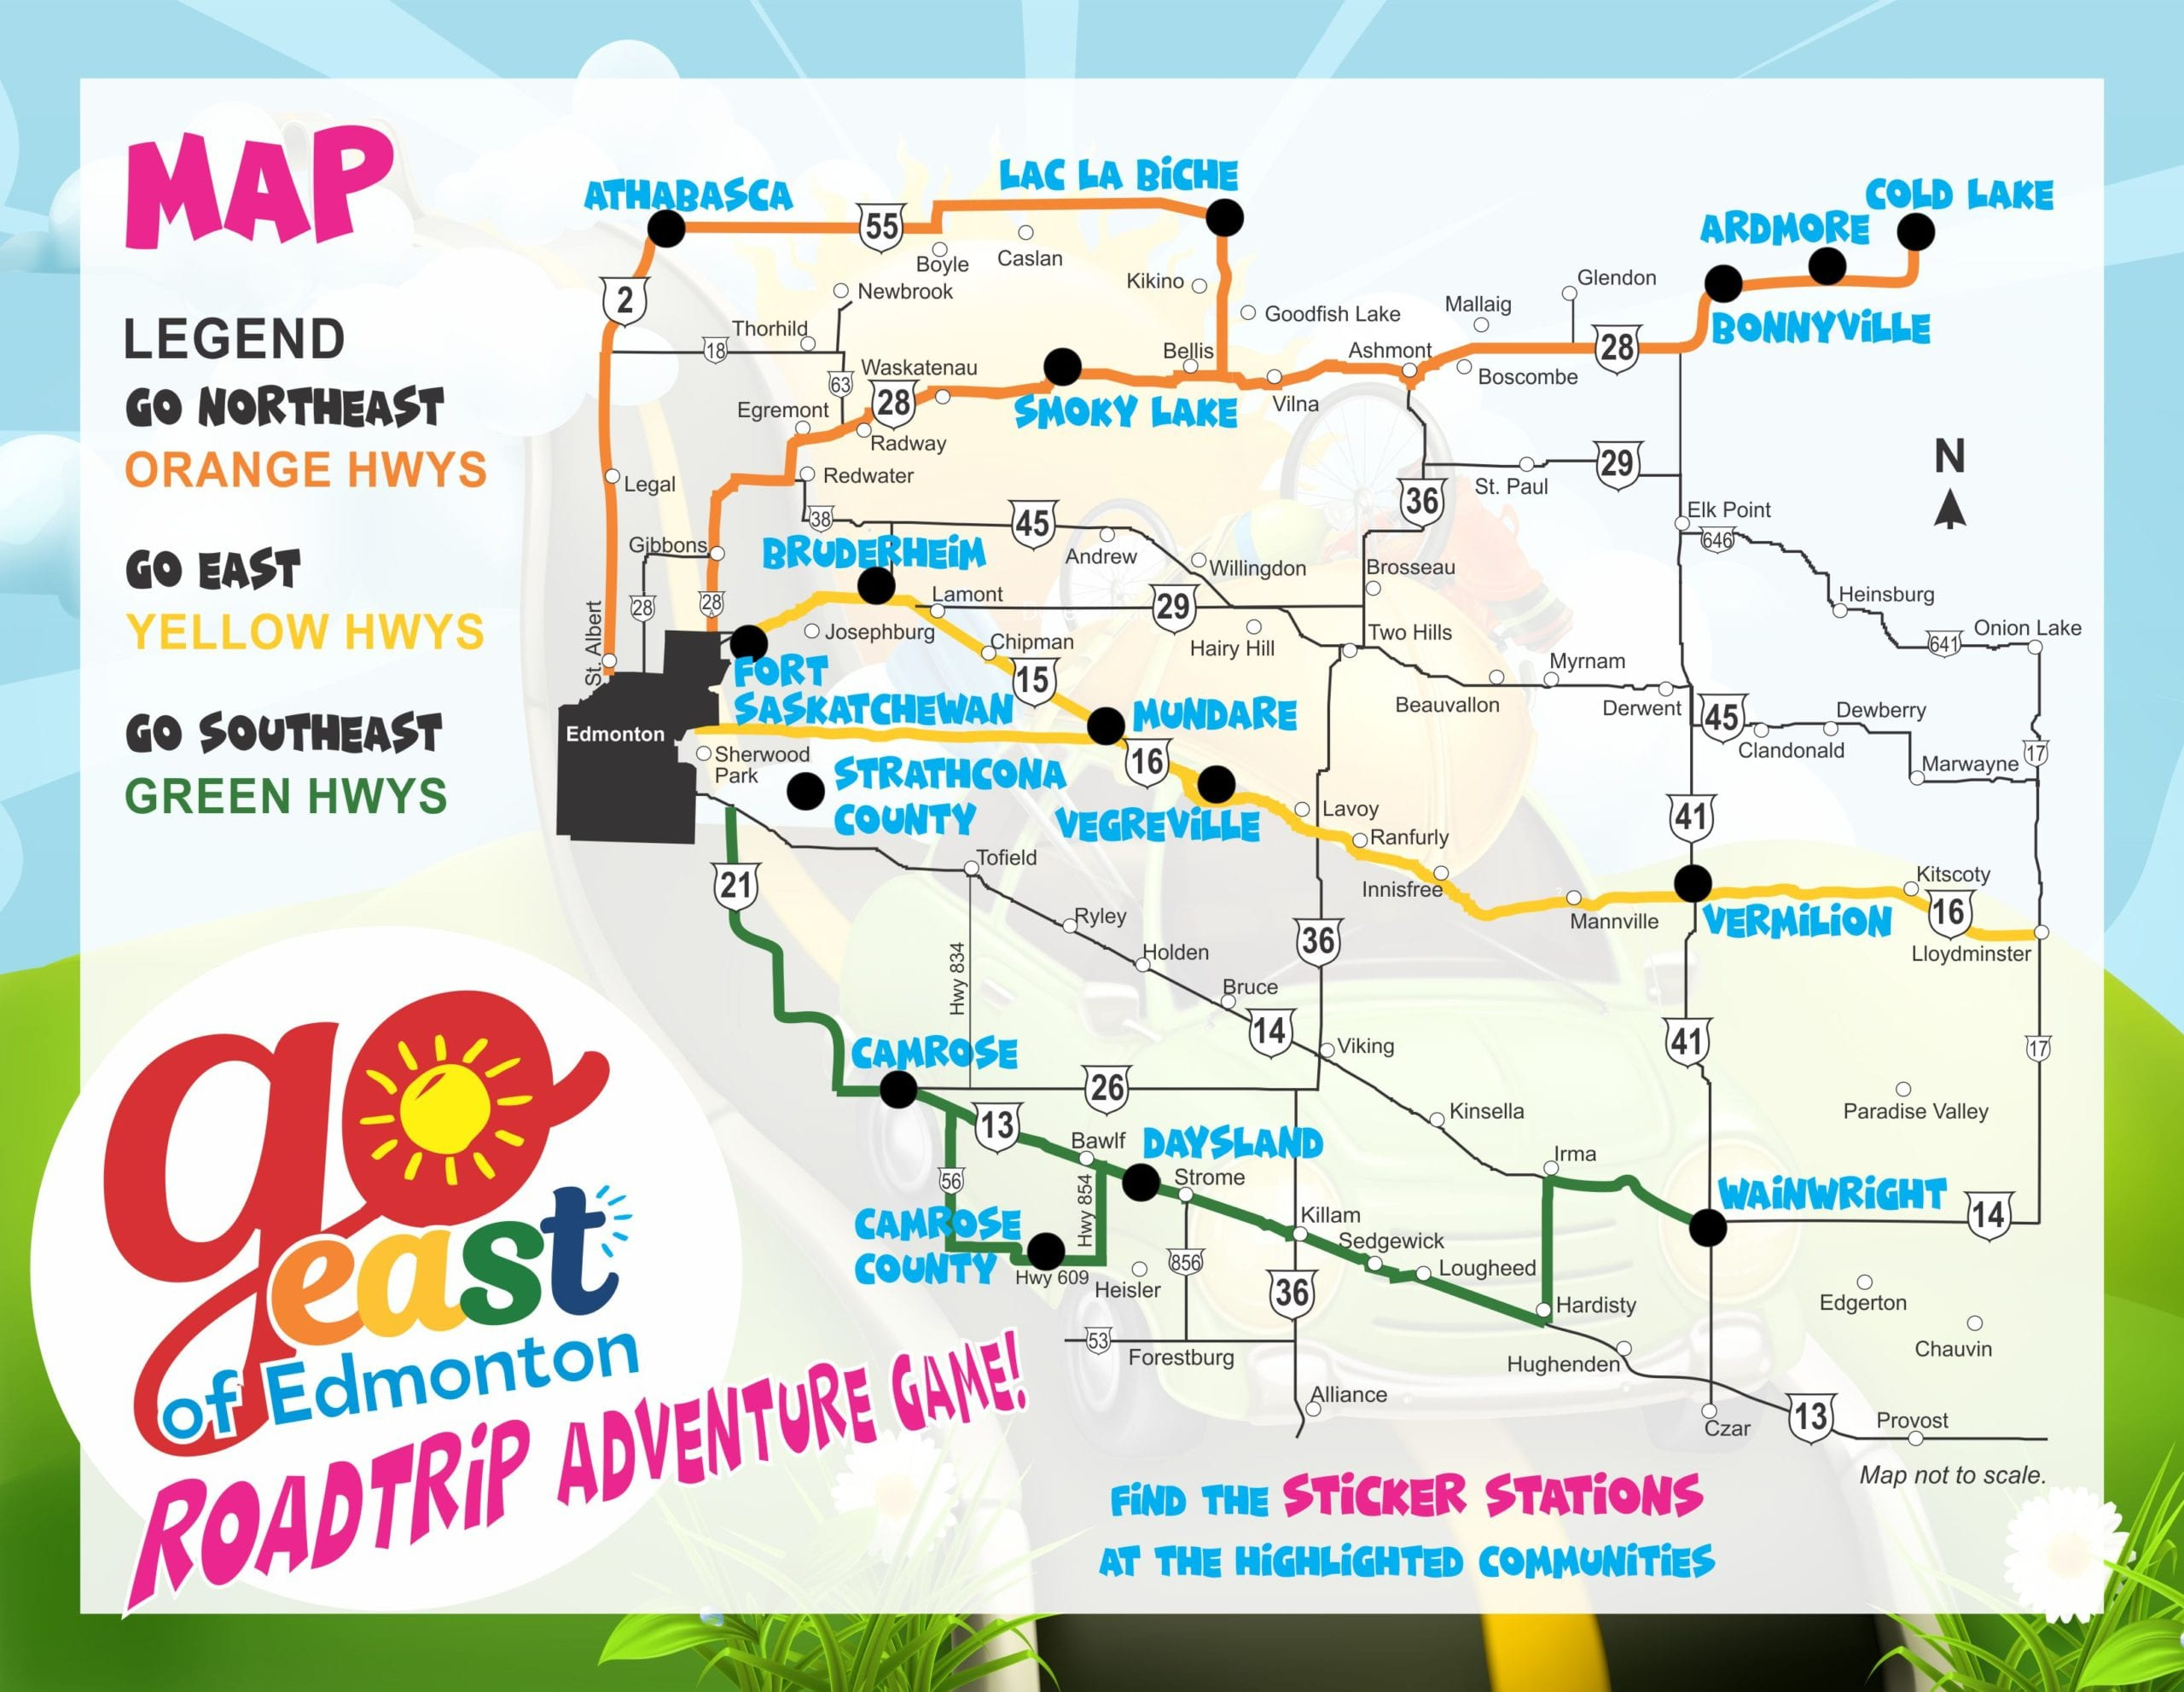 Gee Road Trip Adventure   Go East Of Edmonton with regard to Xyz Is A Calendar-Year Corporation That Began